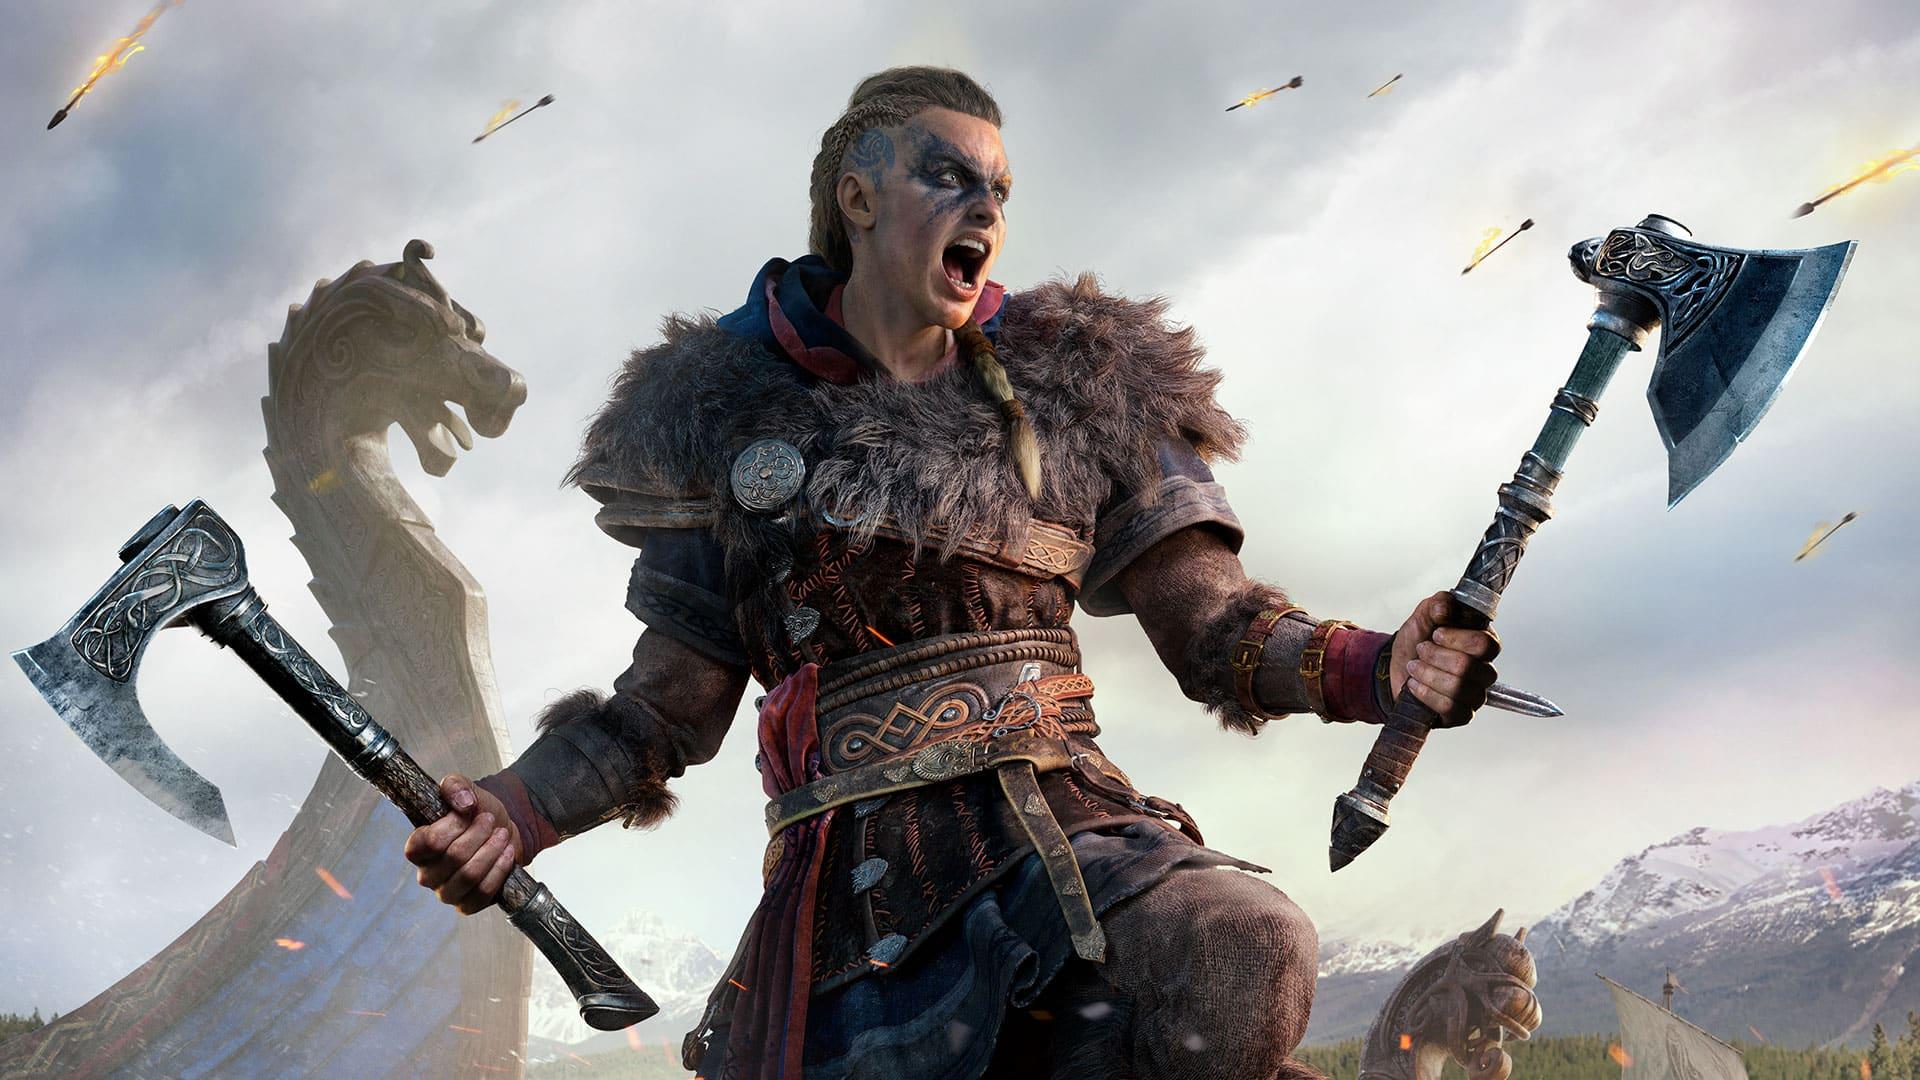 Assassin's Creed Valhala